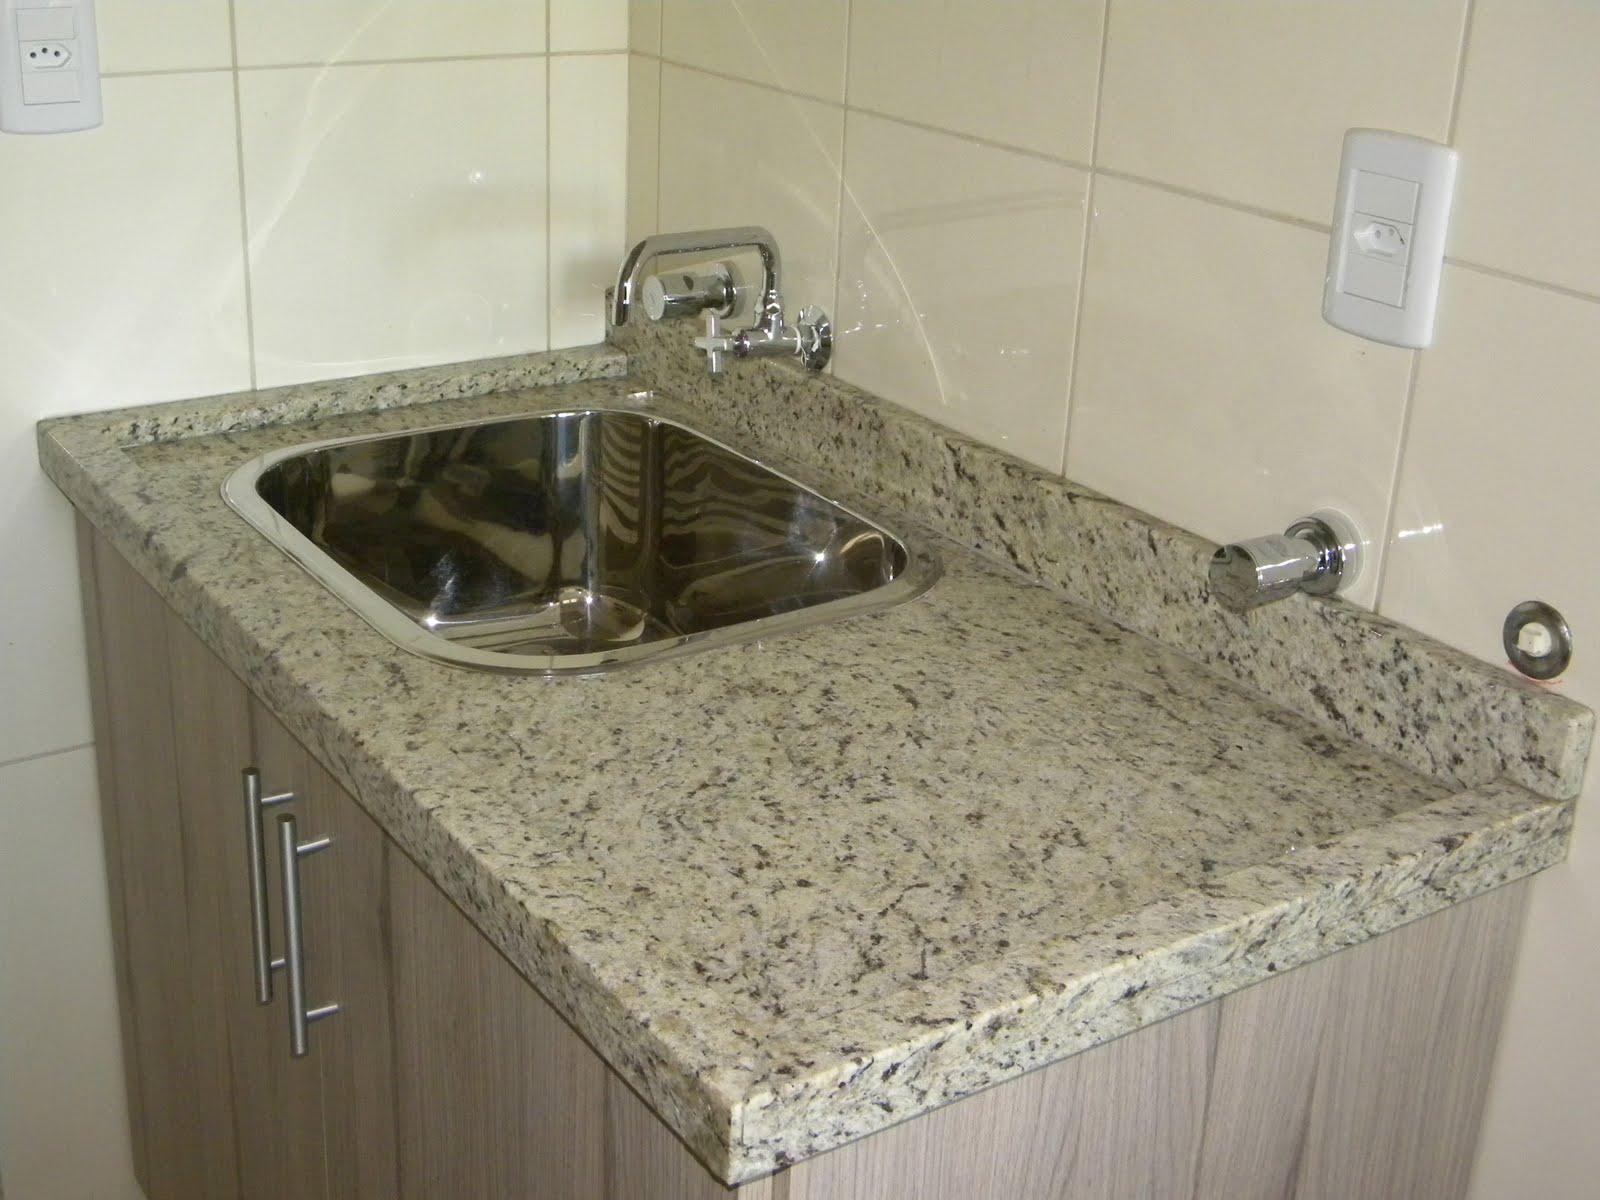 2011 07 31 Marmoraria MPK #3C3826 1600x1200 Banheiro Com Granito Ornamental